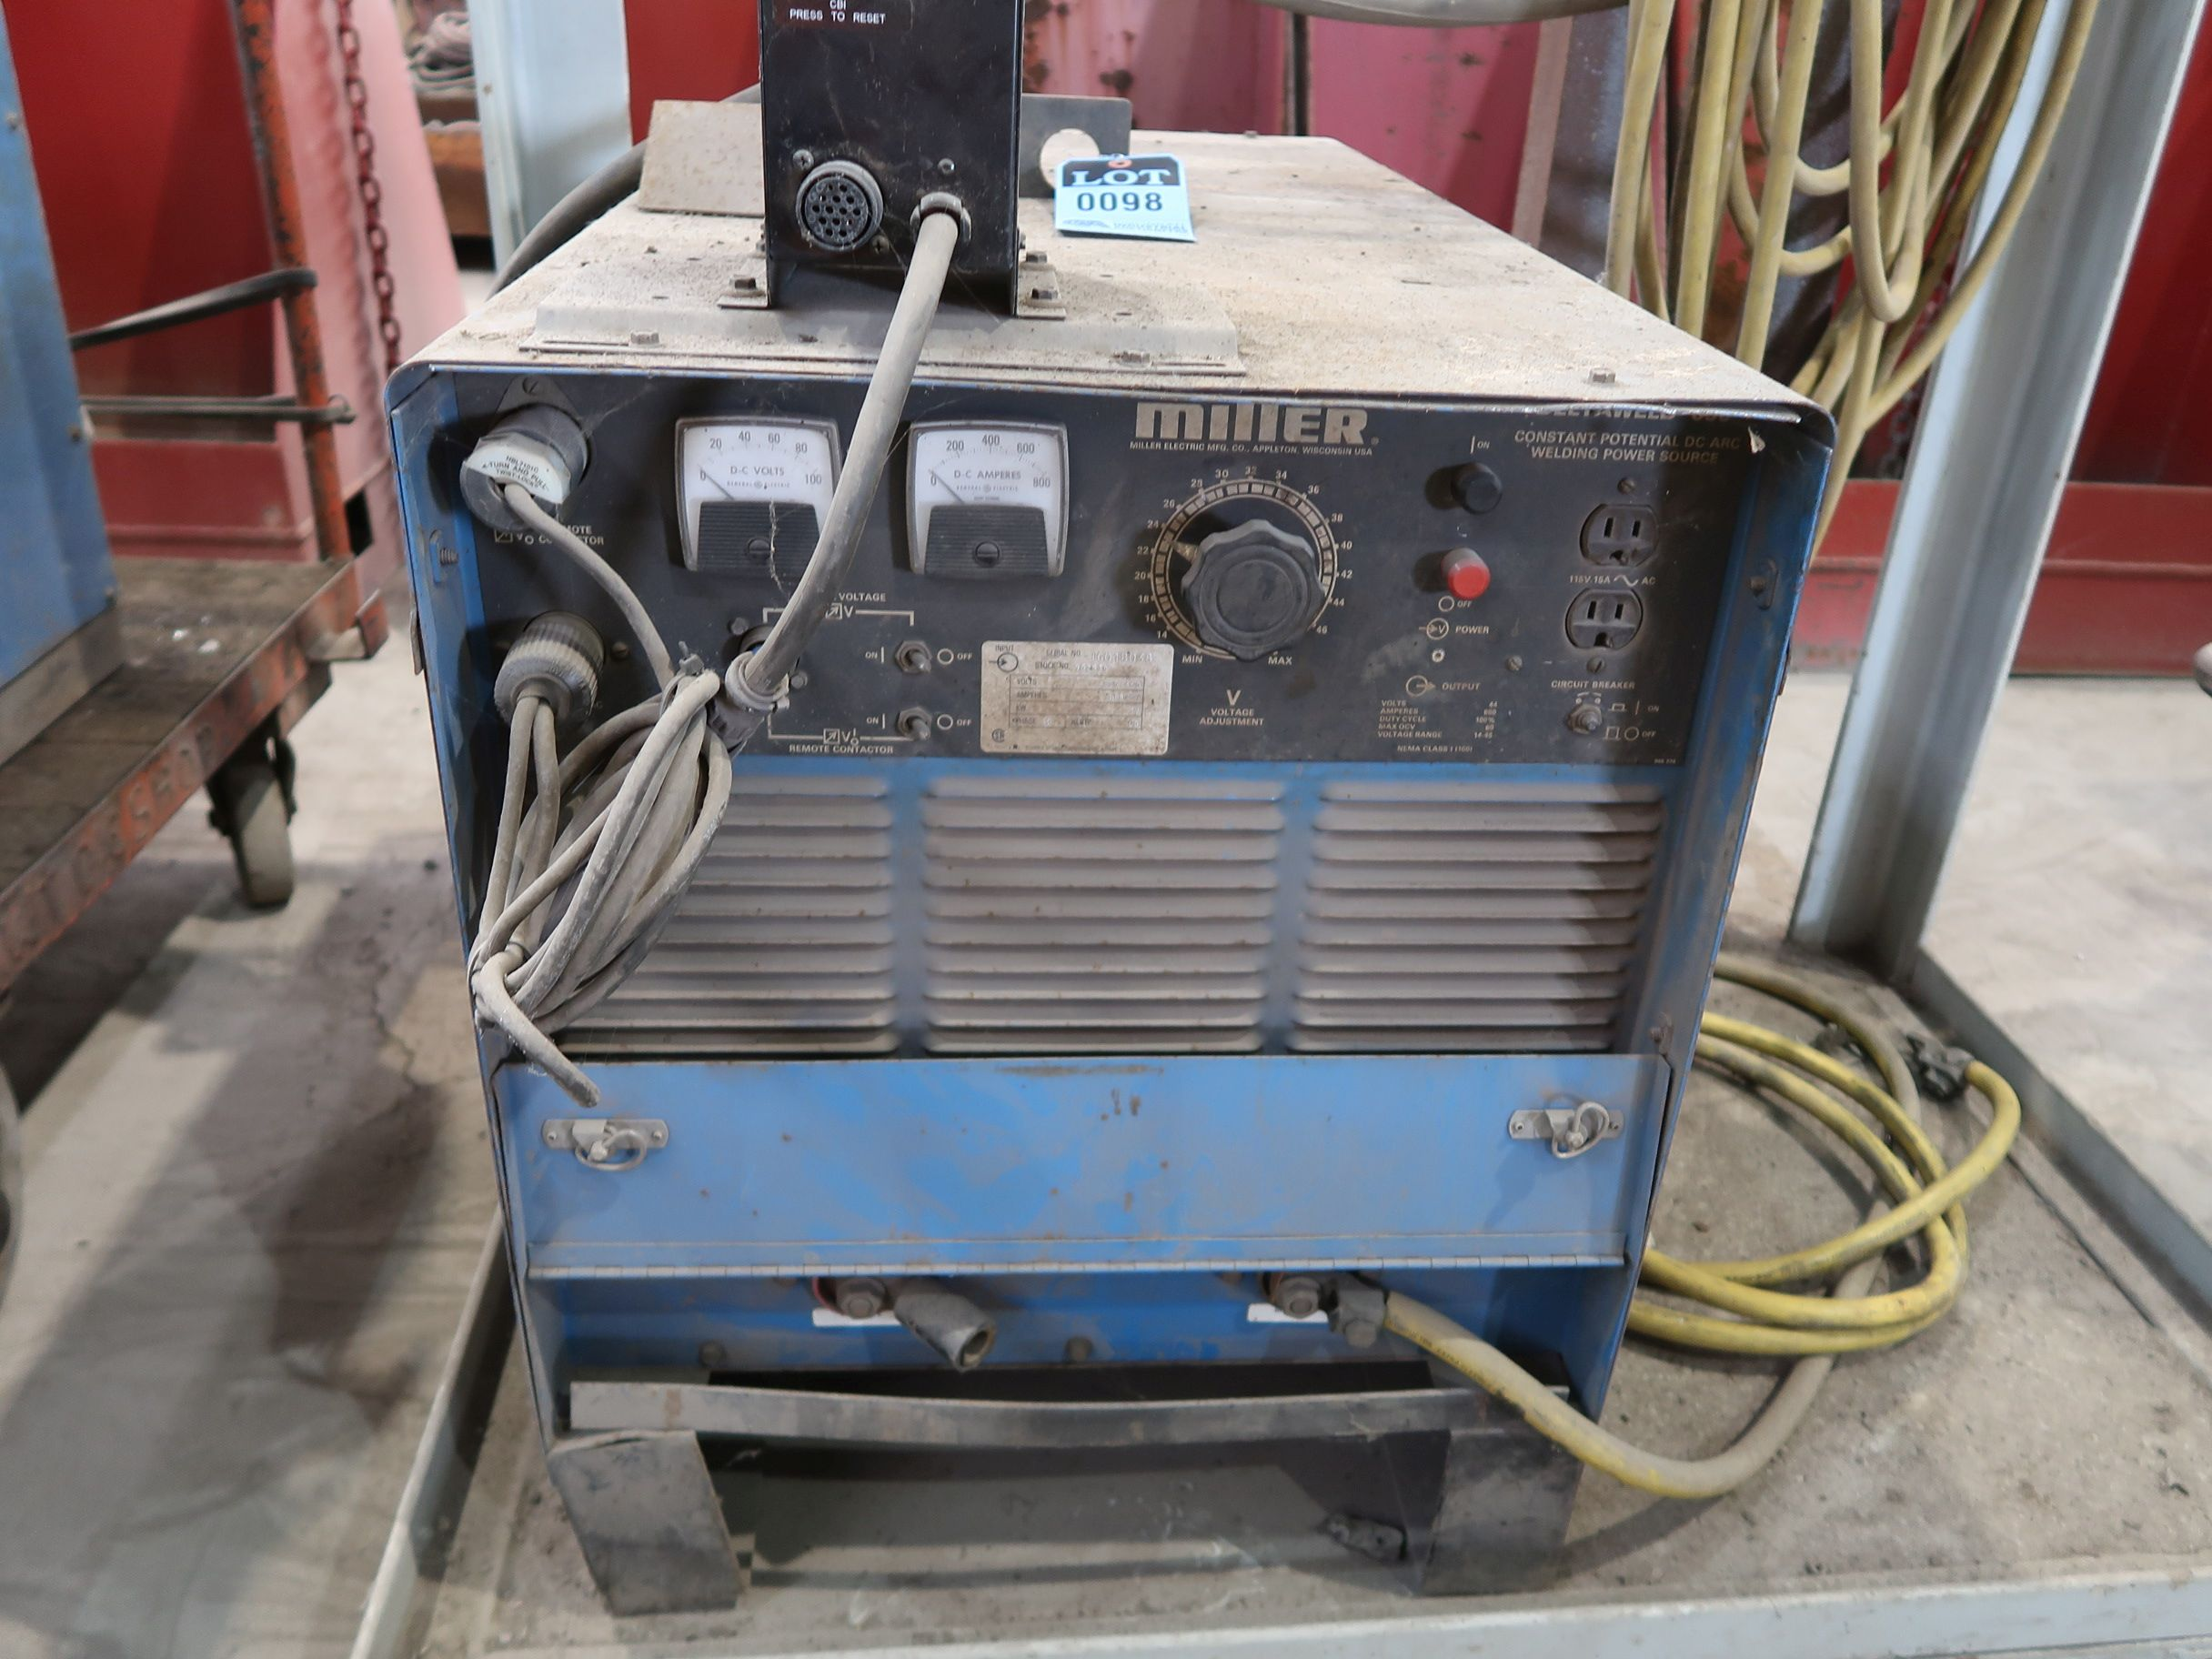 Lot 98 - 650 AMP MILLER MODEL DELTAWELD 650 CONSTANT POTENTIAL DC ARC WELDING POWER SOURCE; S/N JG018038